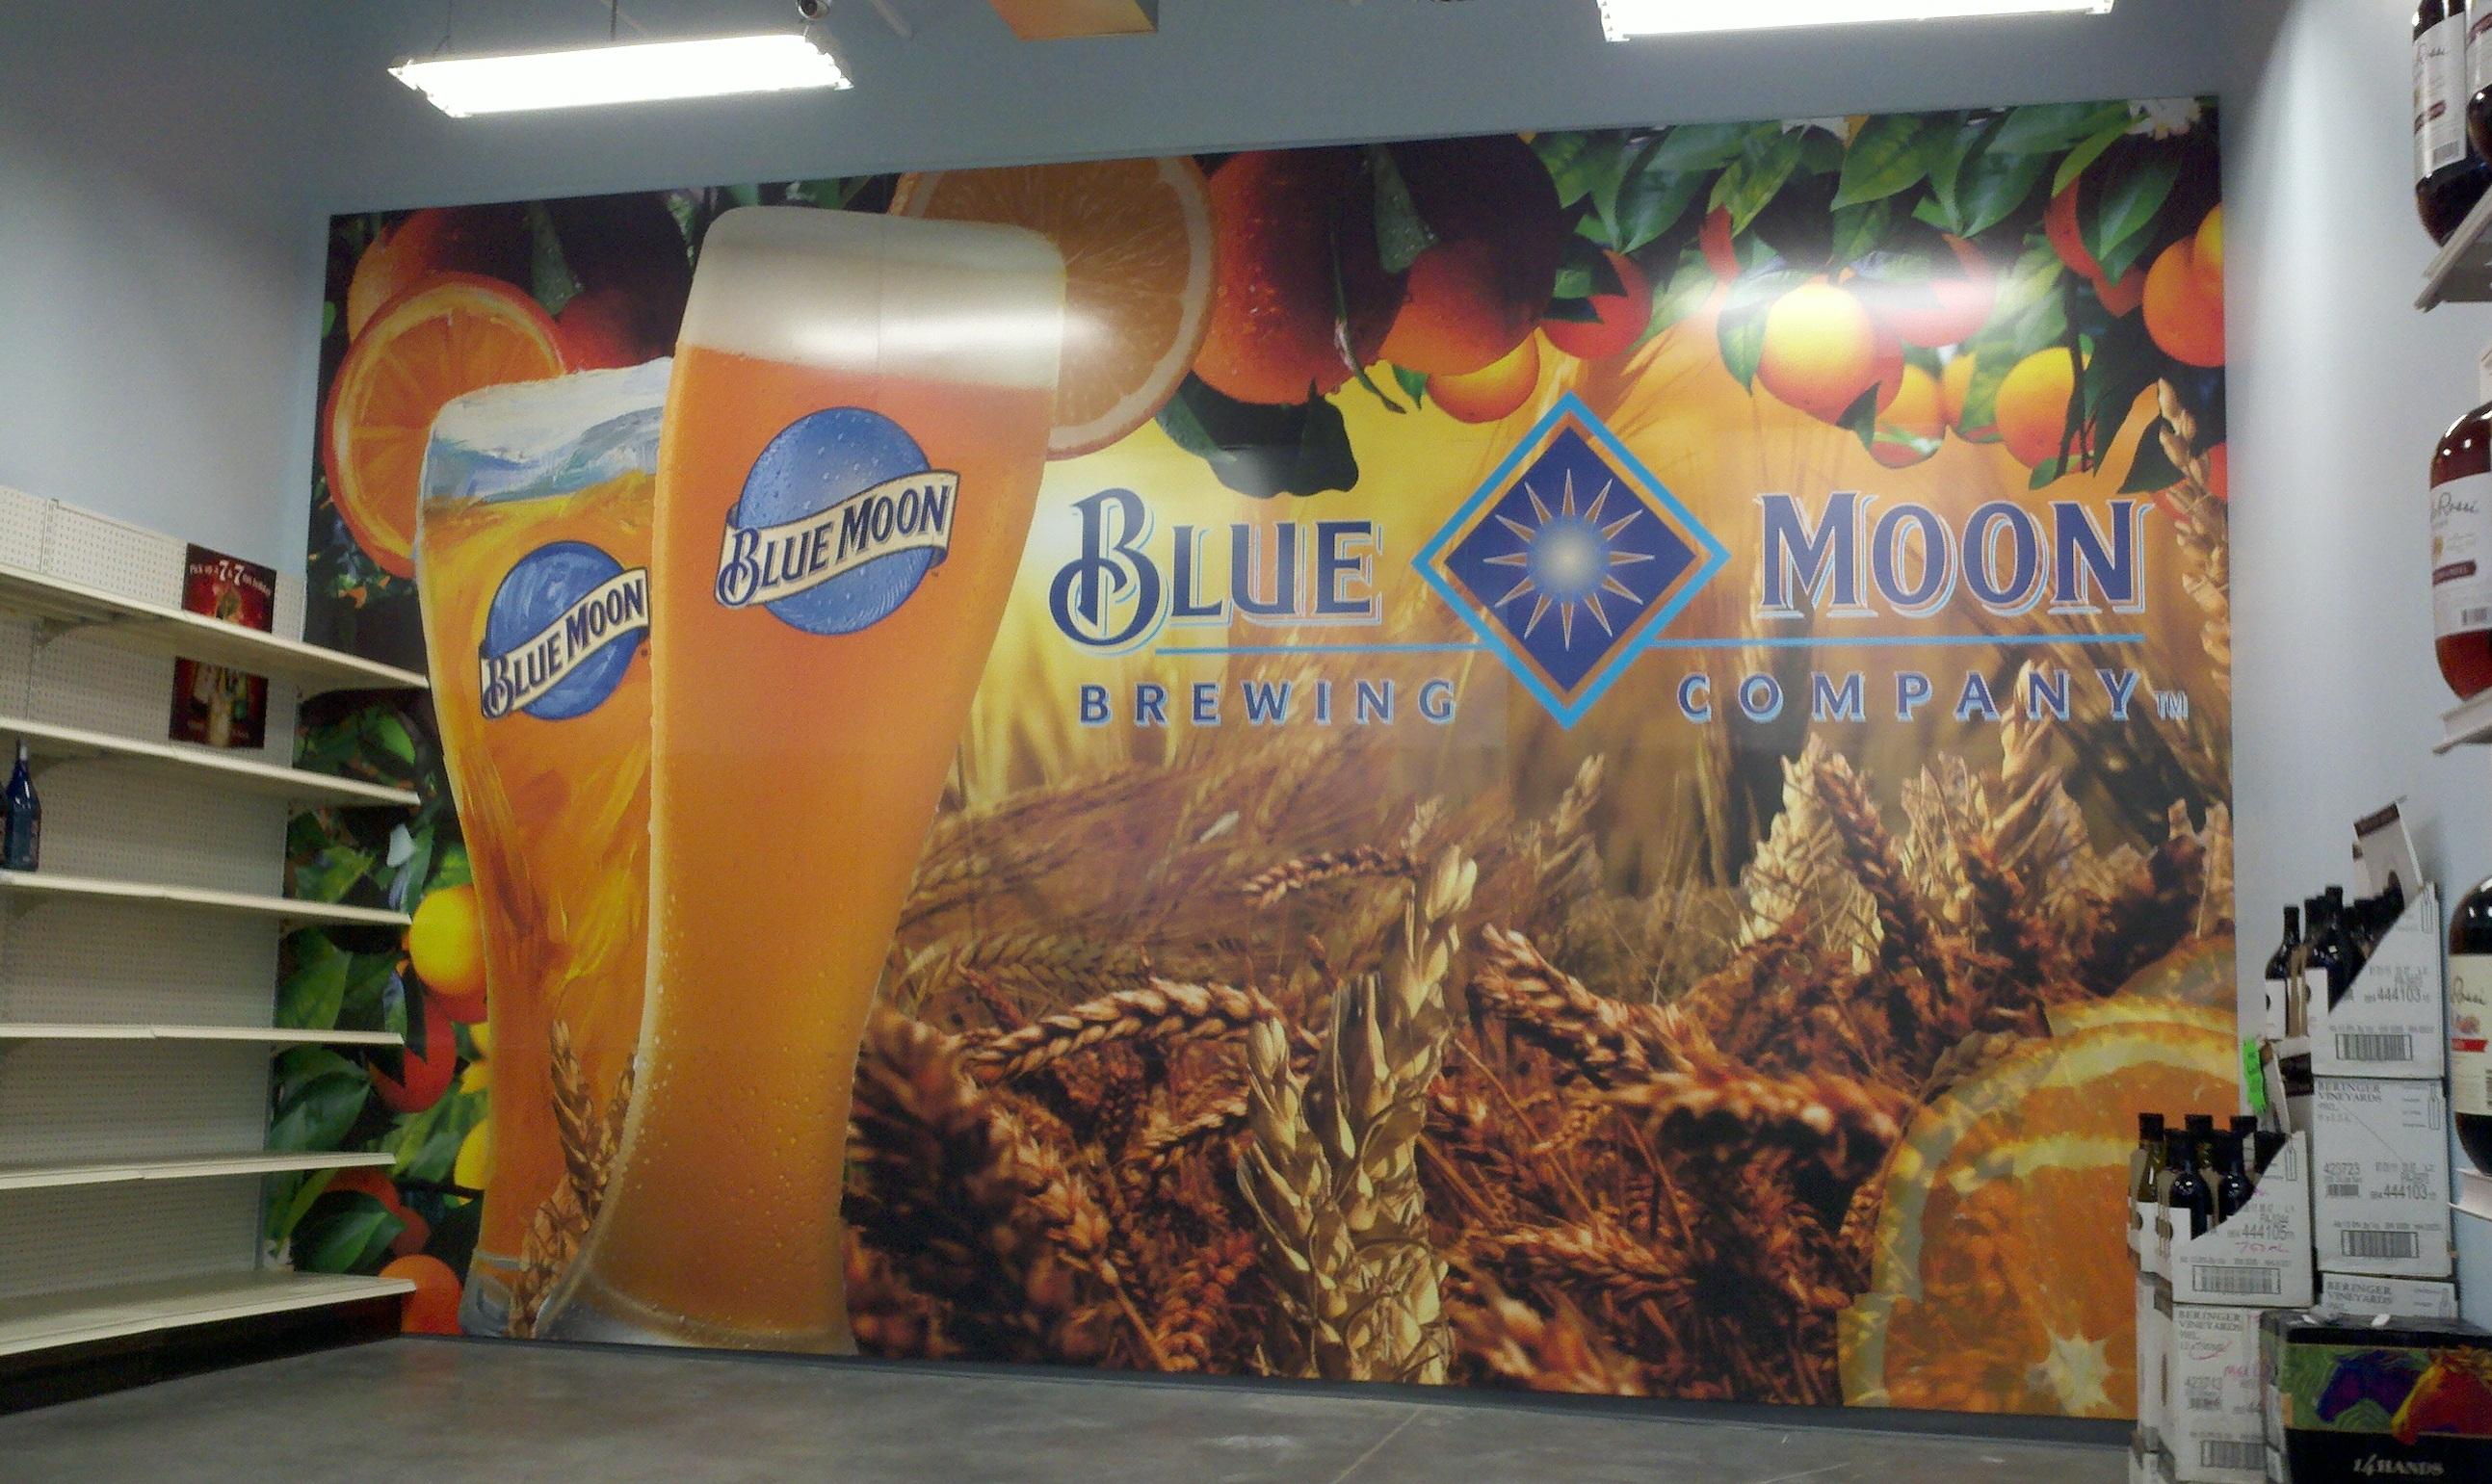 Printing branding backgrounds for beers lexjet blog for Blue moon mural